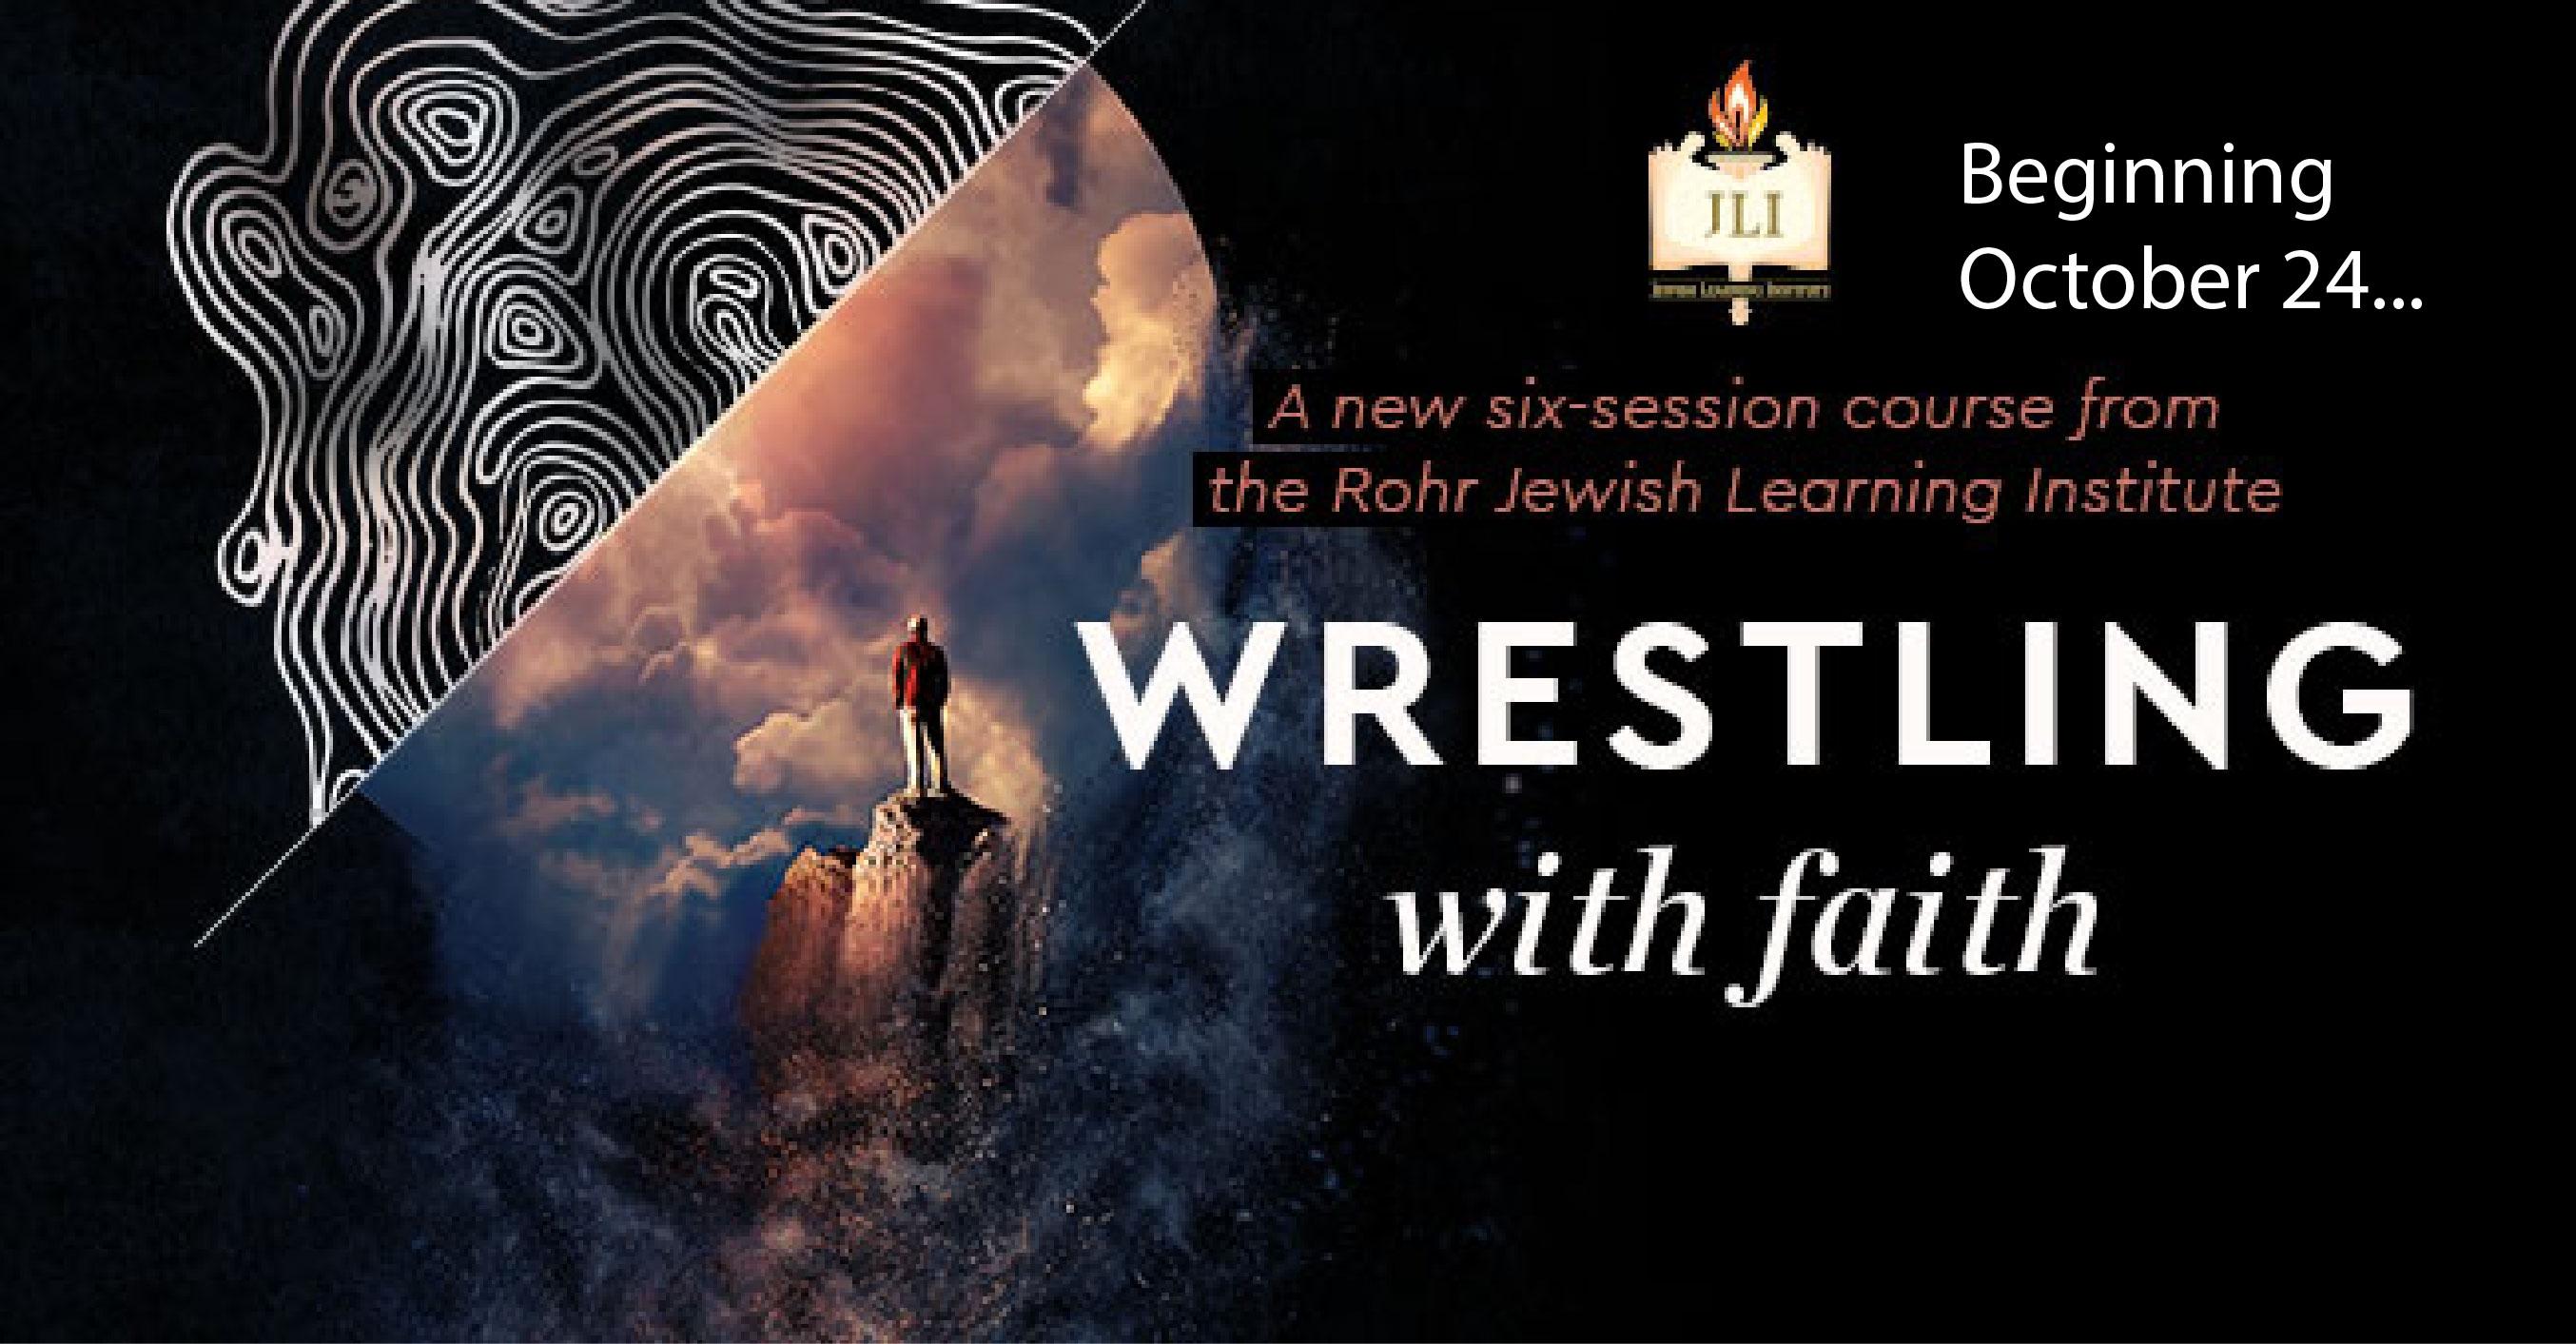 wrestling-with-faith_email-header_650x400-01.jpg